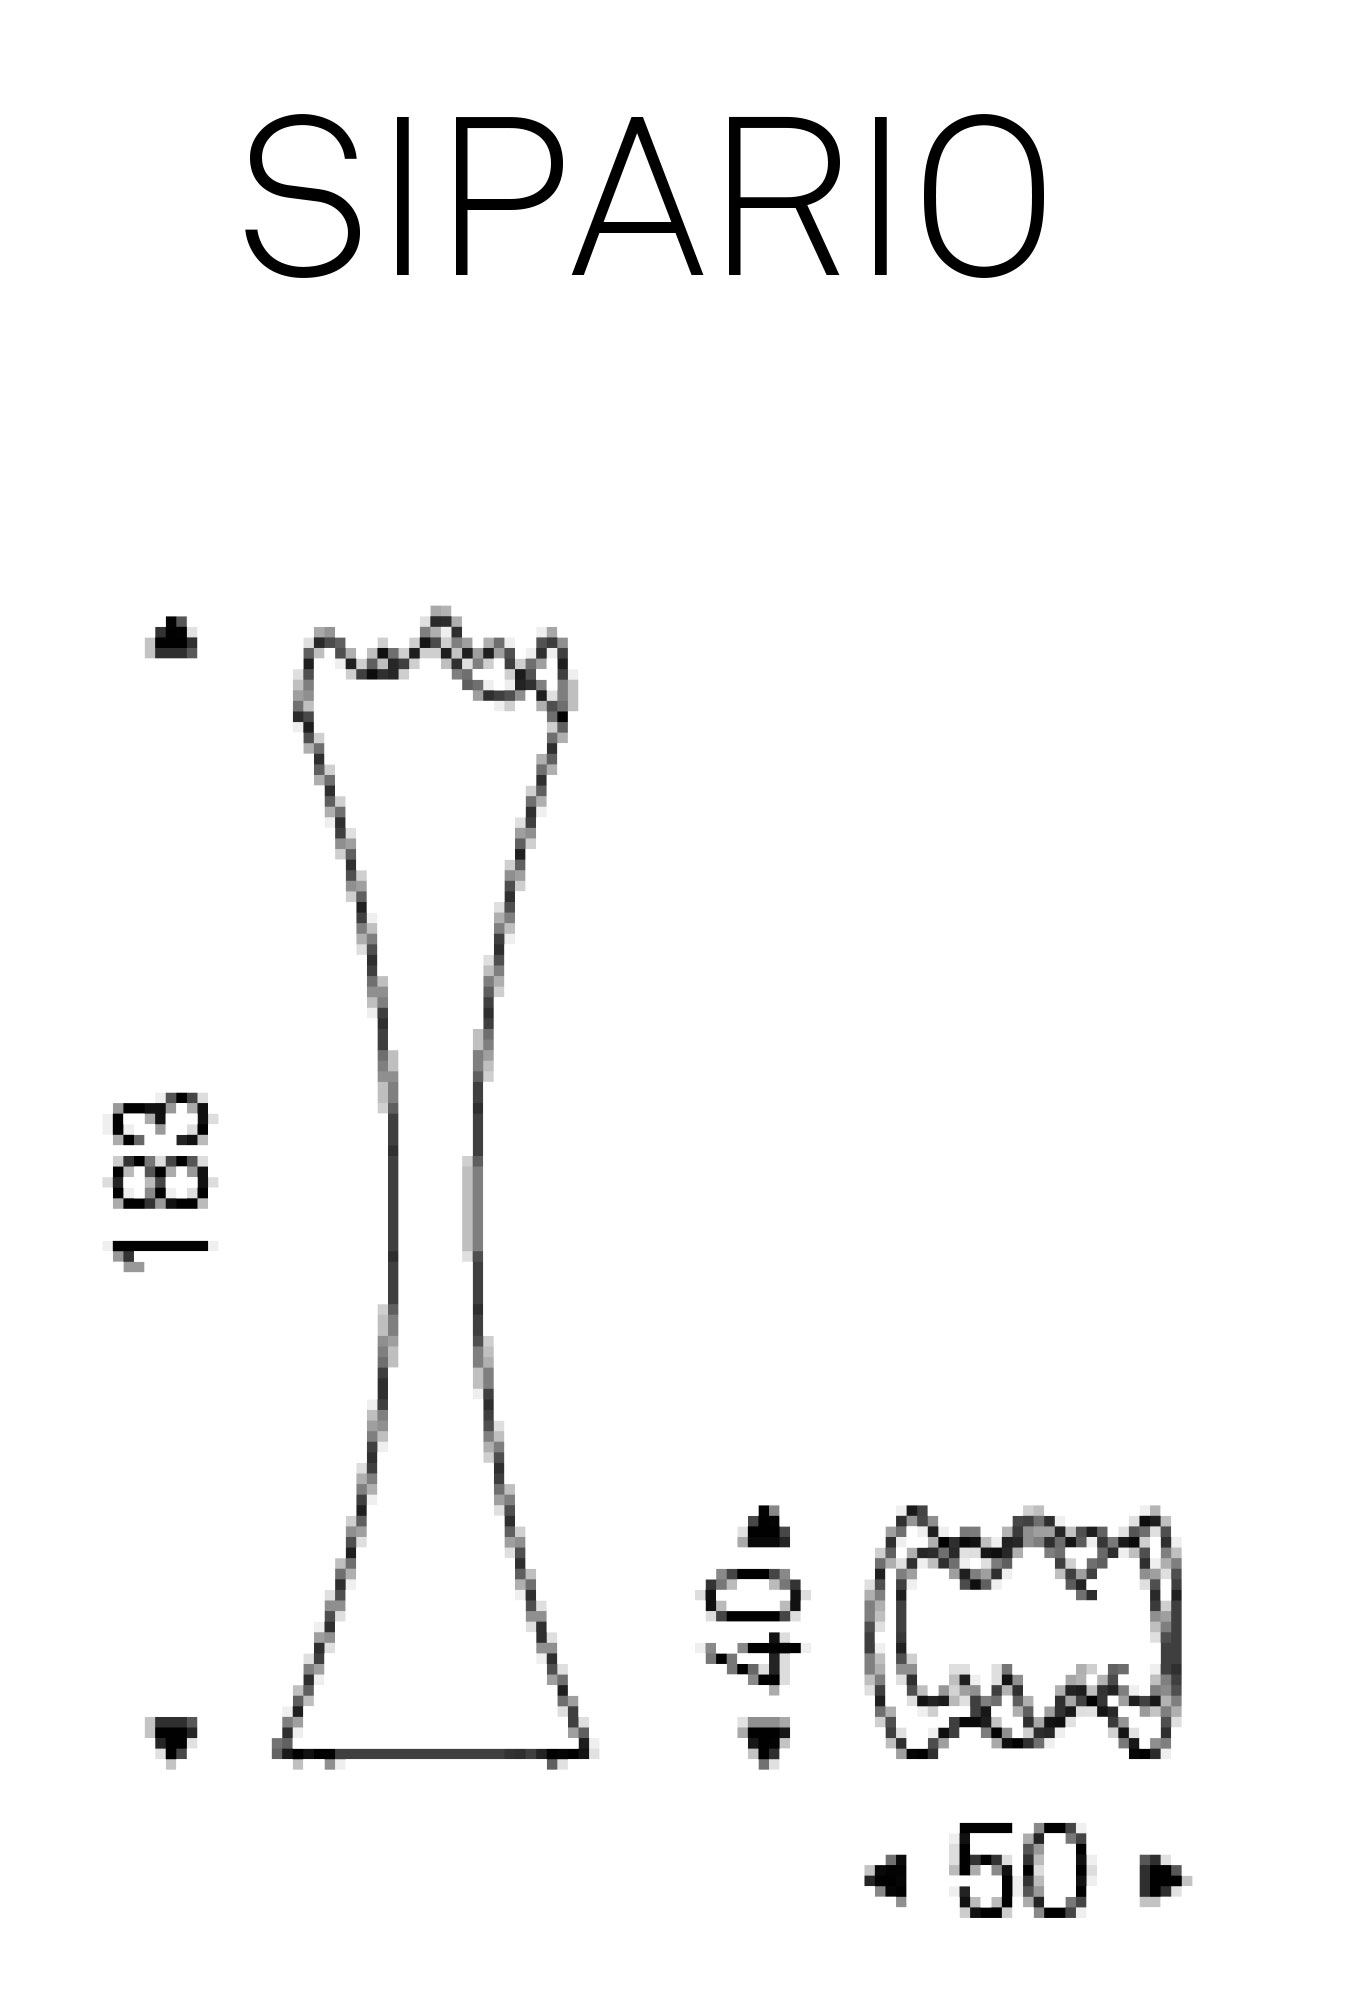 Appendiabiti Sipario Cattelan dimensioni